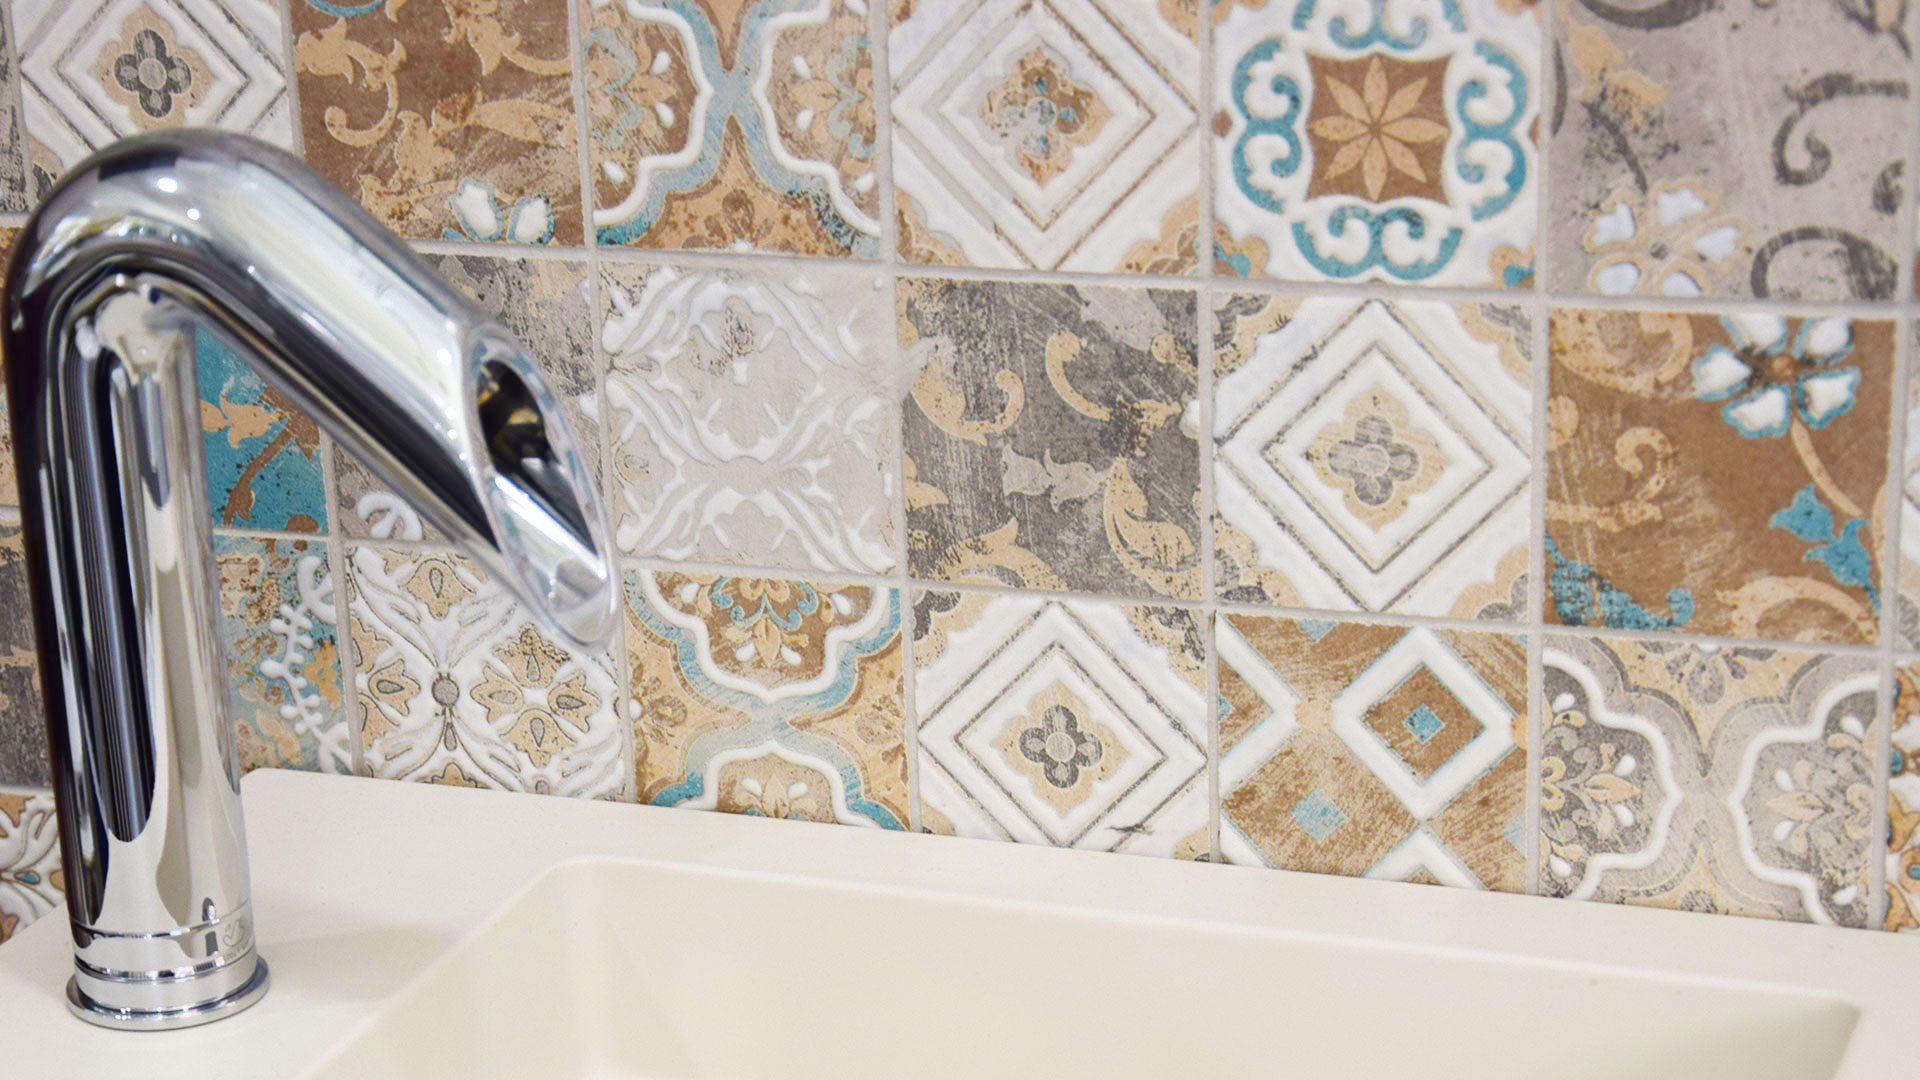 Piastrelle bagno roma interesting piastrelle bagno moderno consigli bagno with piastrelle bagno - Piastrelle bagno damascate ...